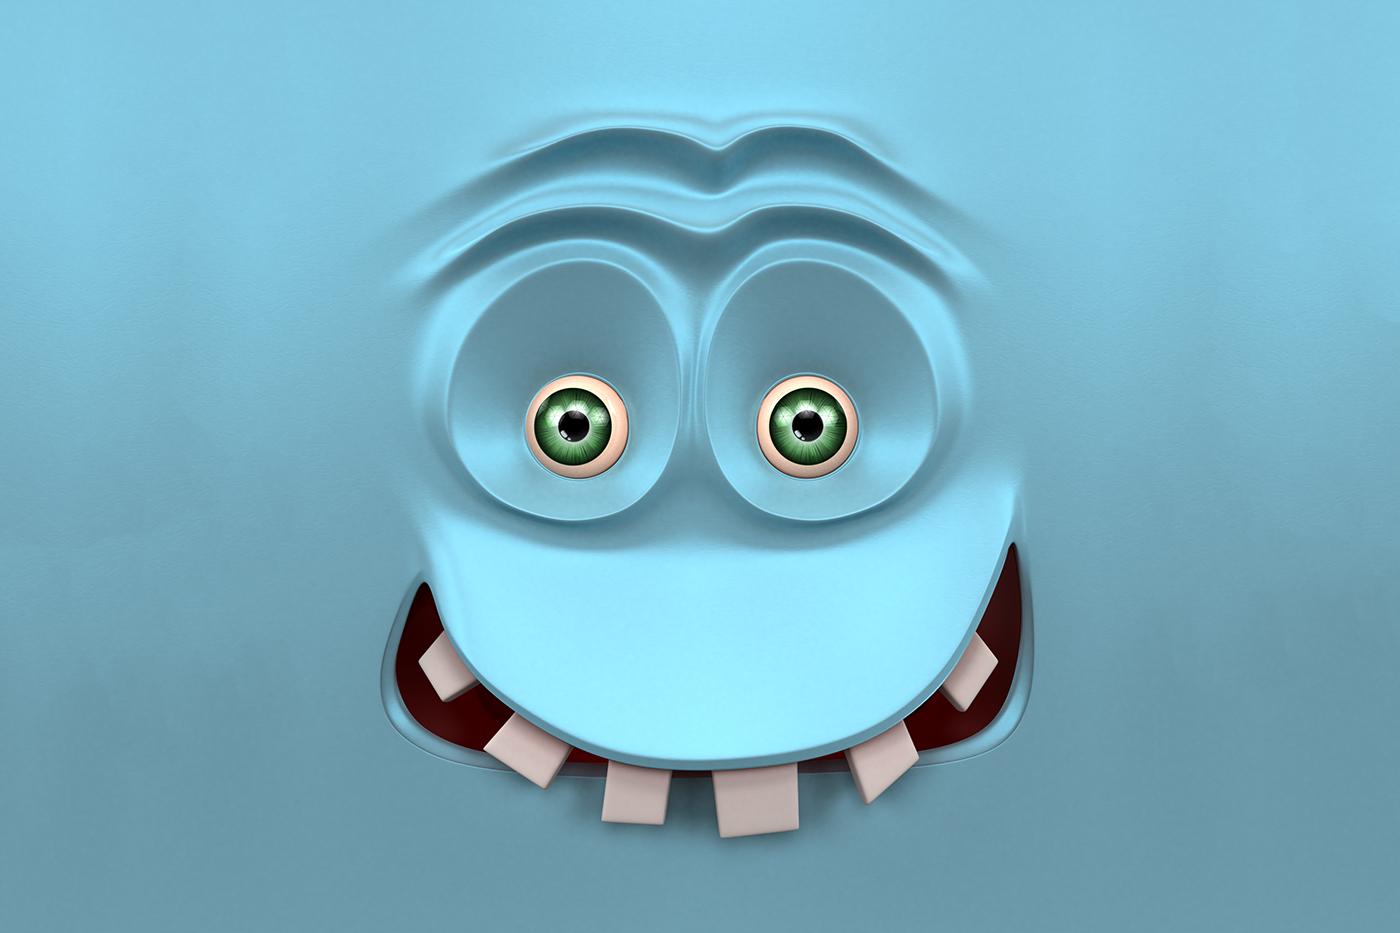 cartoon 3D expressions APA Member Pantone Canvas The National Design AIGA member SAIC